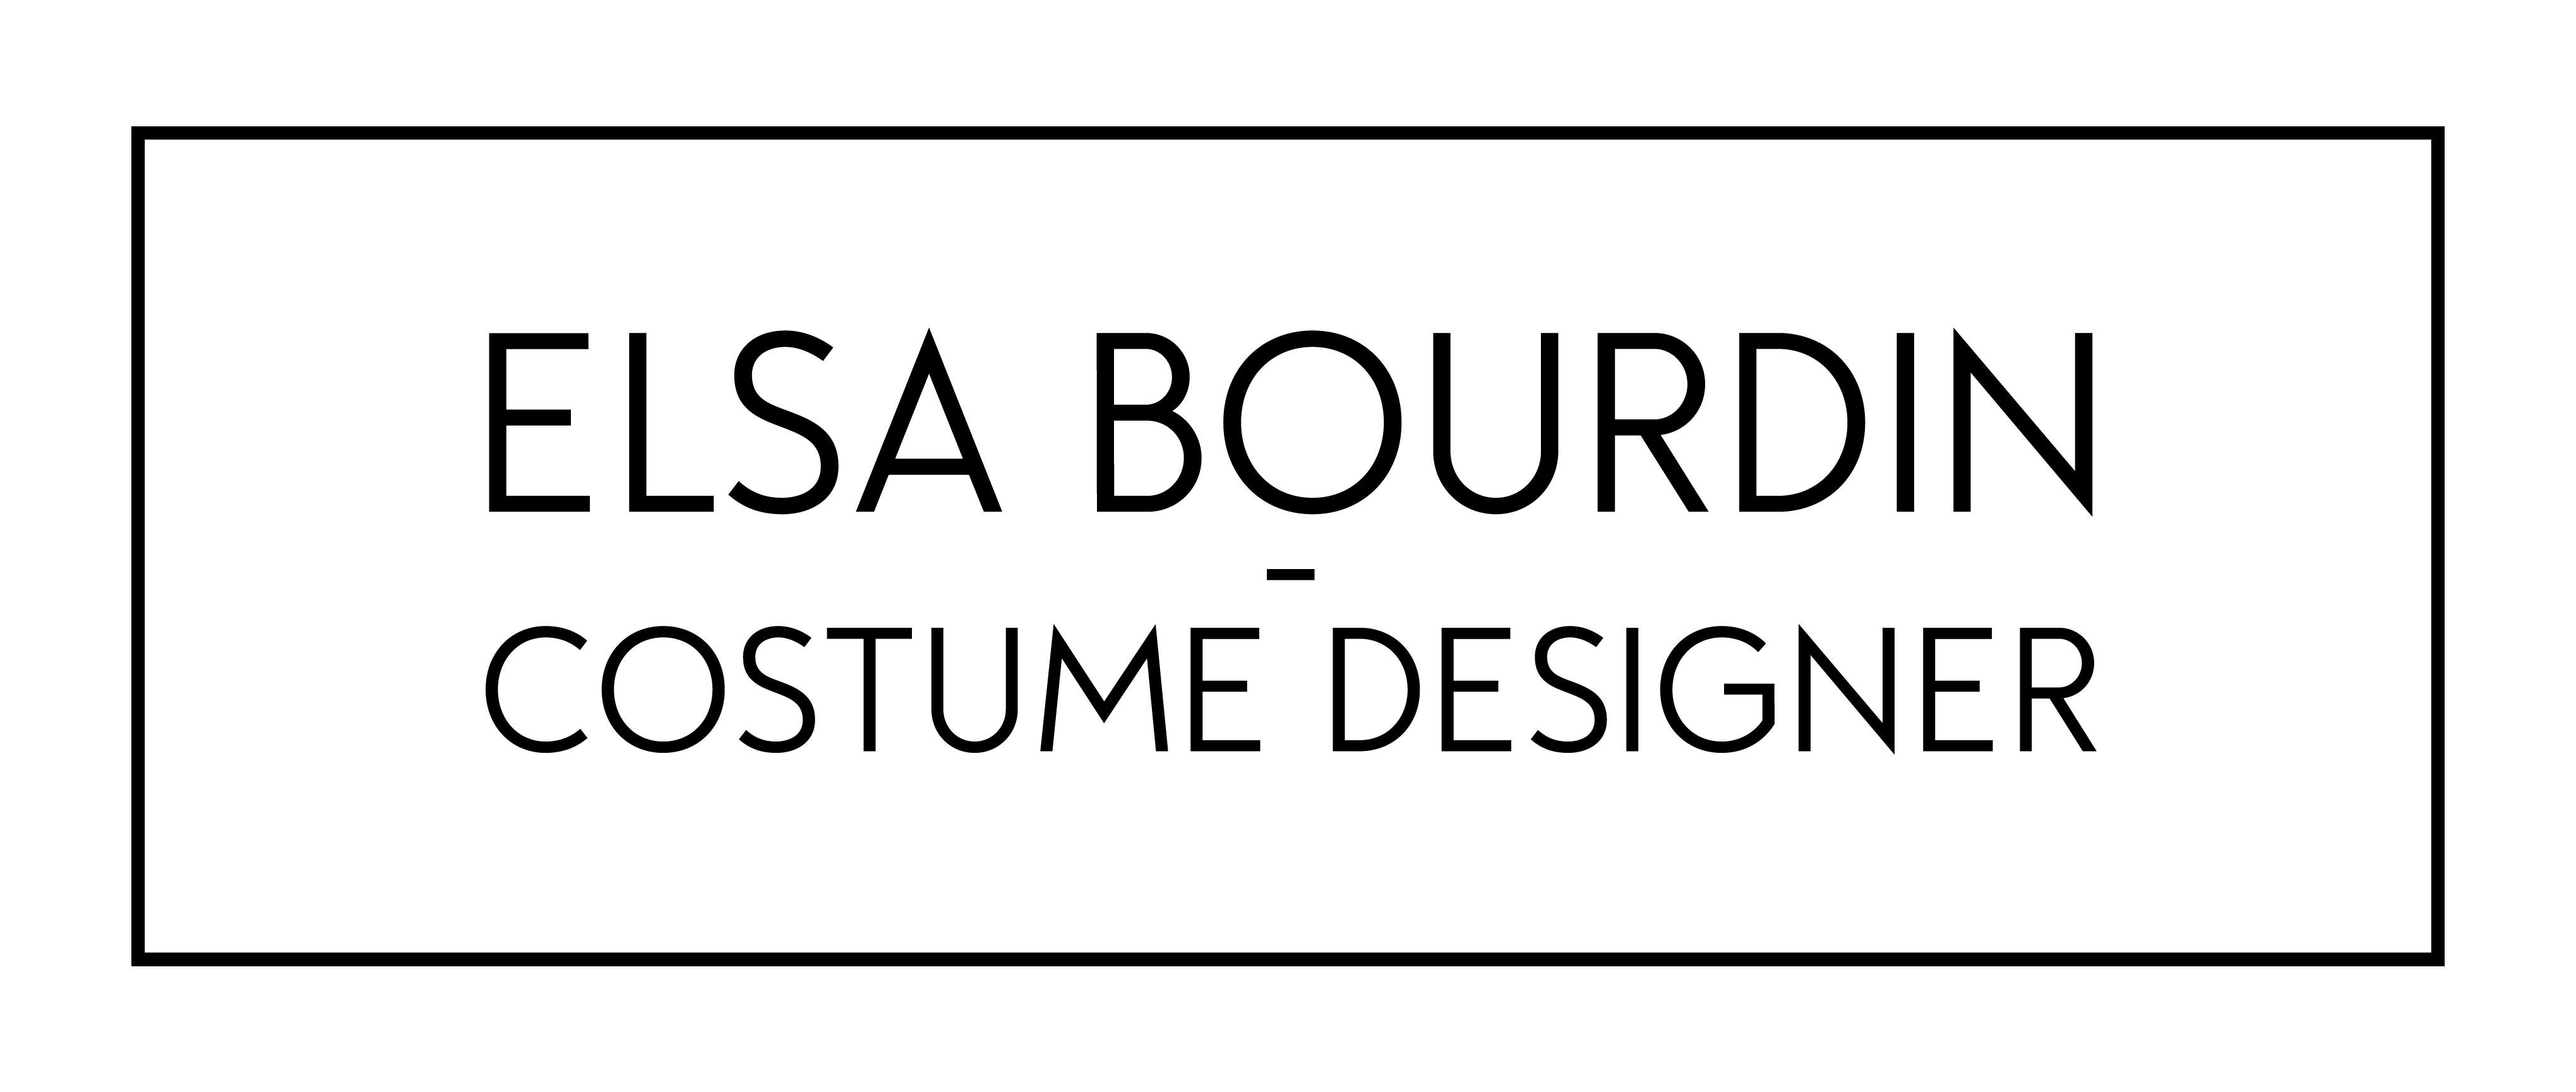 ELSA BOURDIN • COSTUME DESIGNER